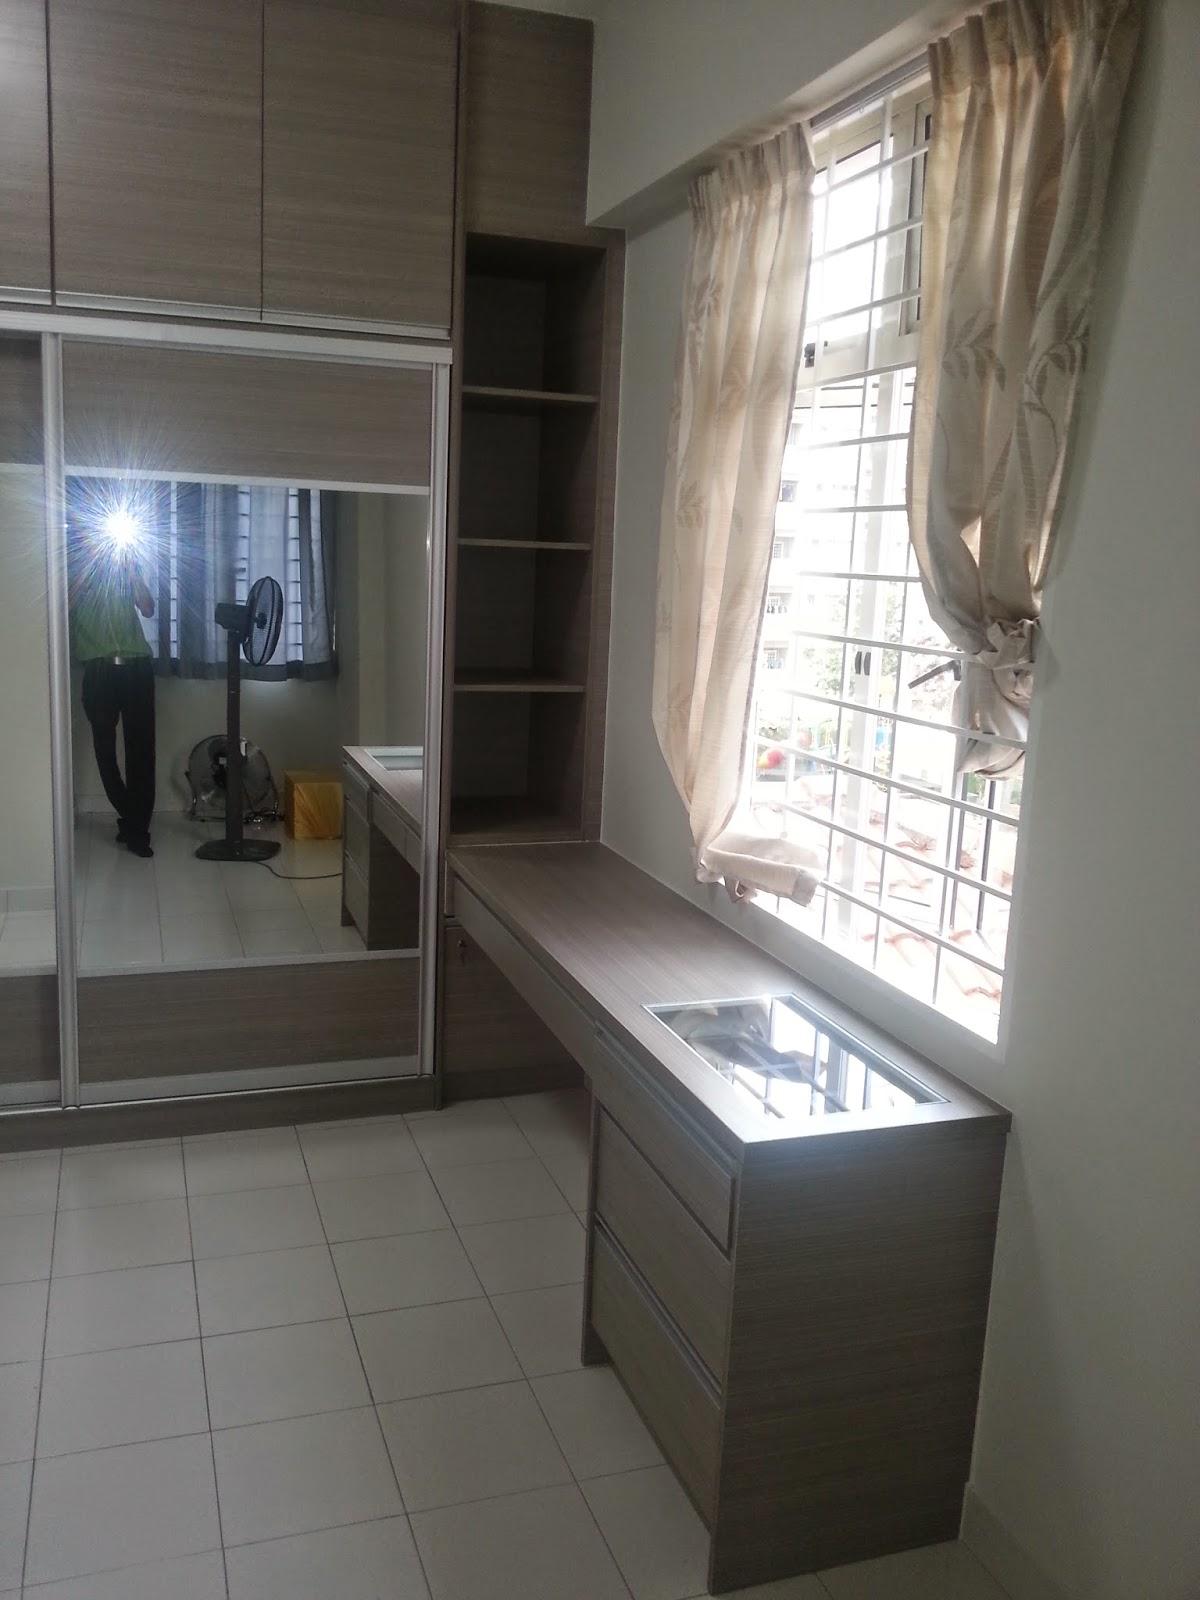 Exceptional Kitchen Cabinet And Built In Wardrobe Melamine Antijump Sliding .